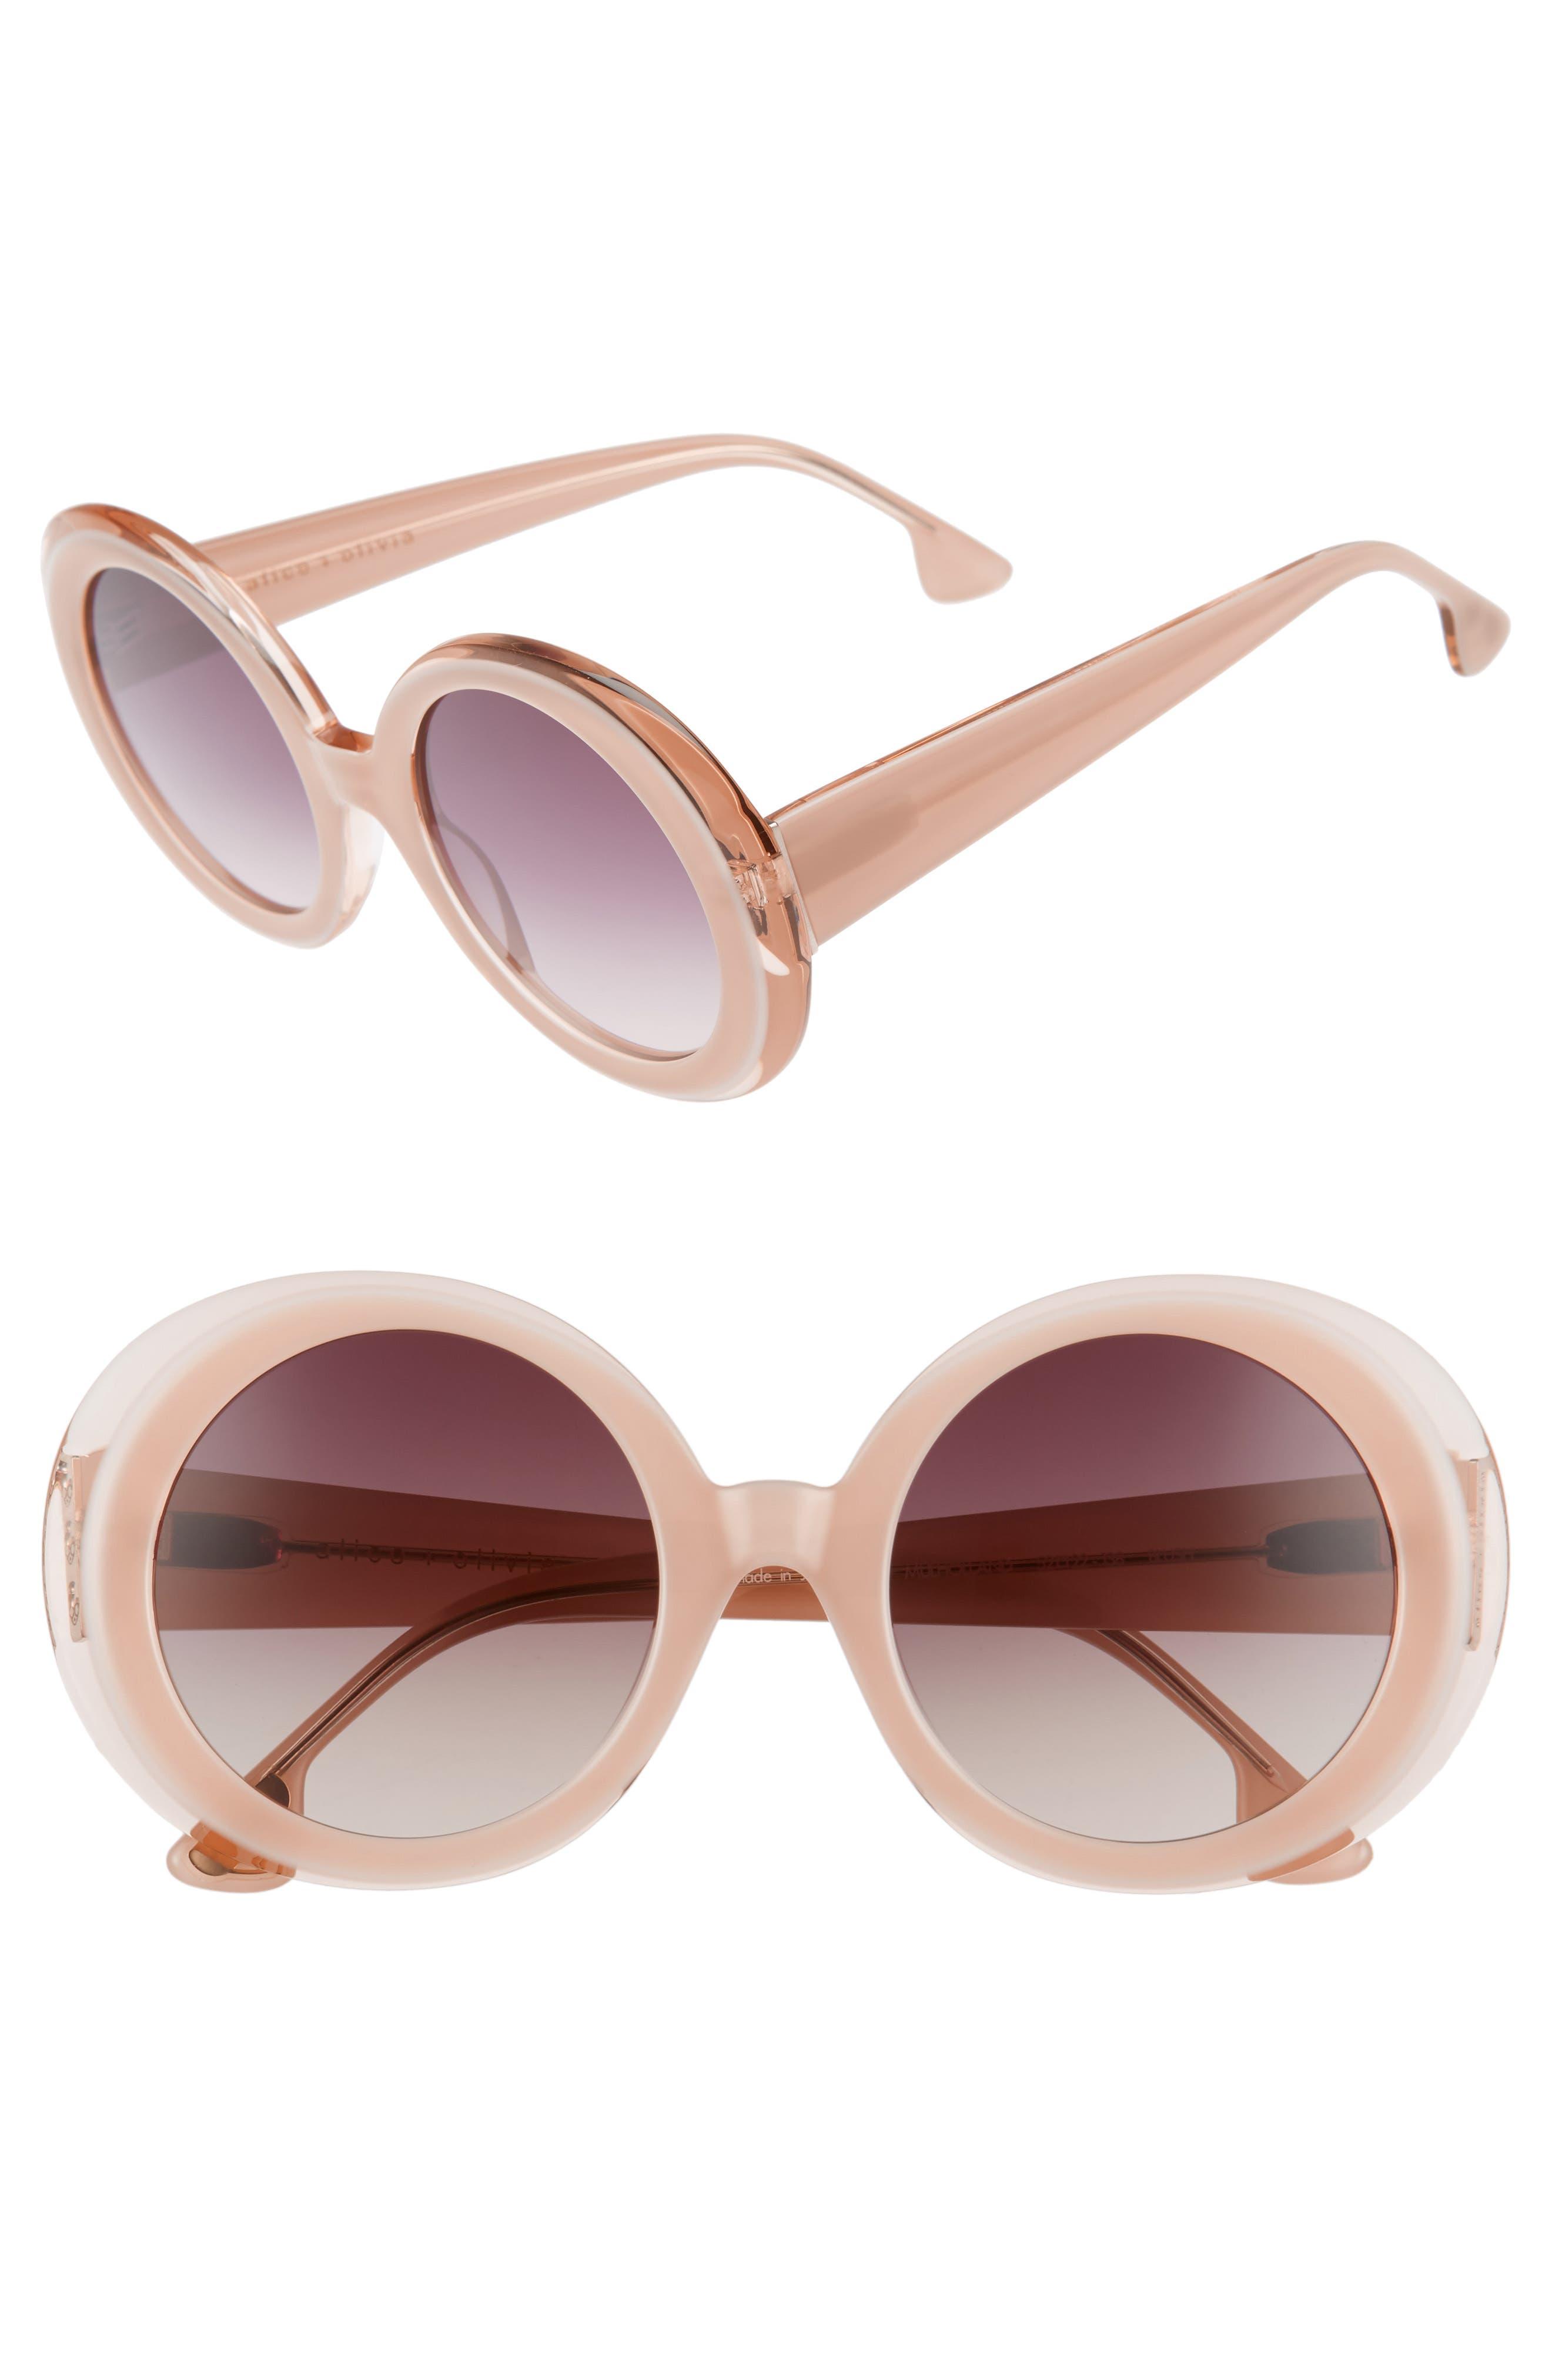 Main Image - Alice + Olivia Mulholland 52mm Round Gradient Sunglasses